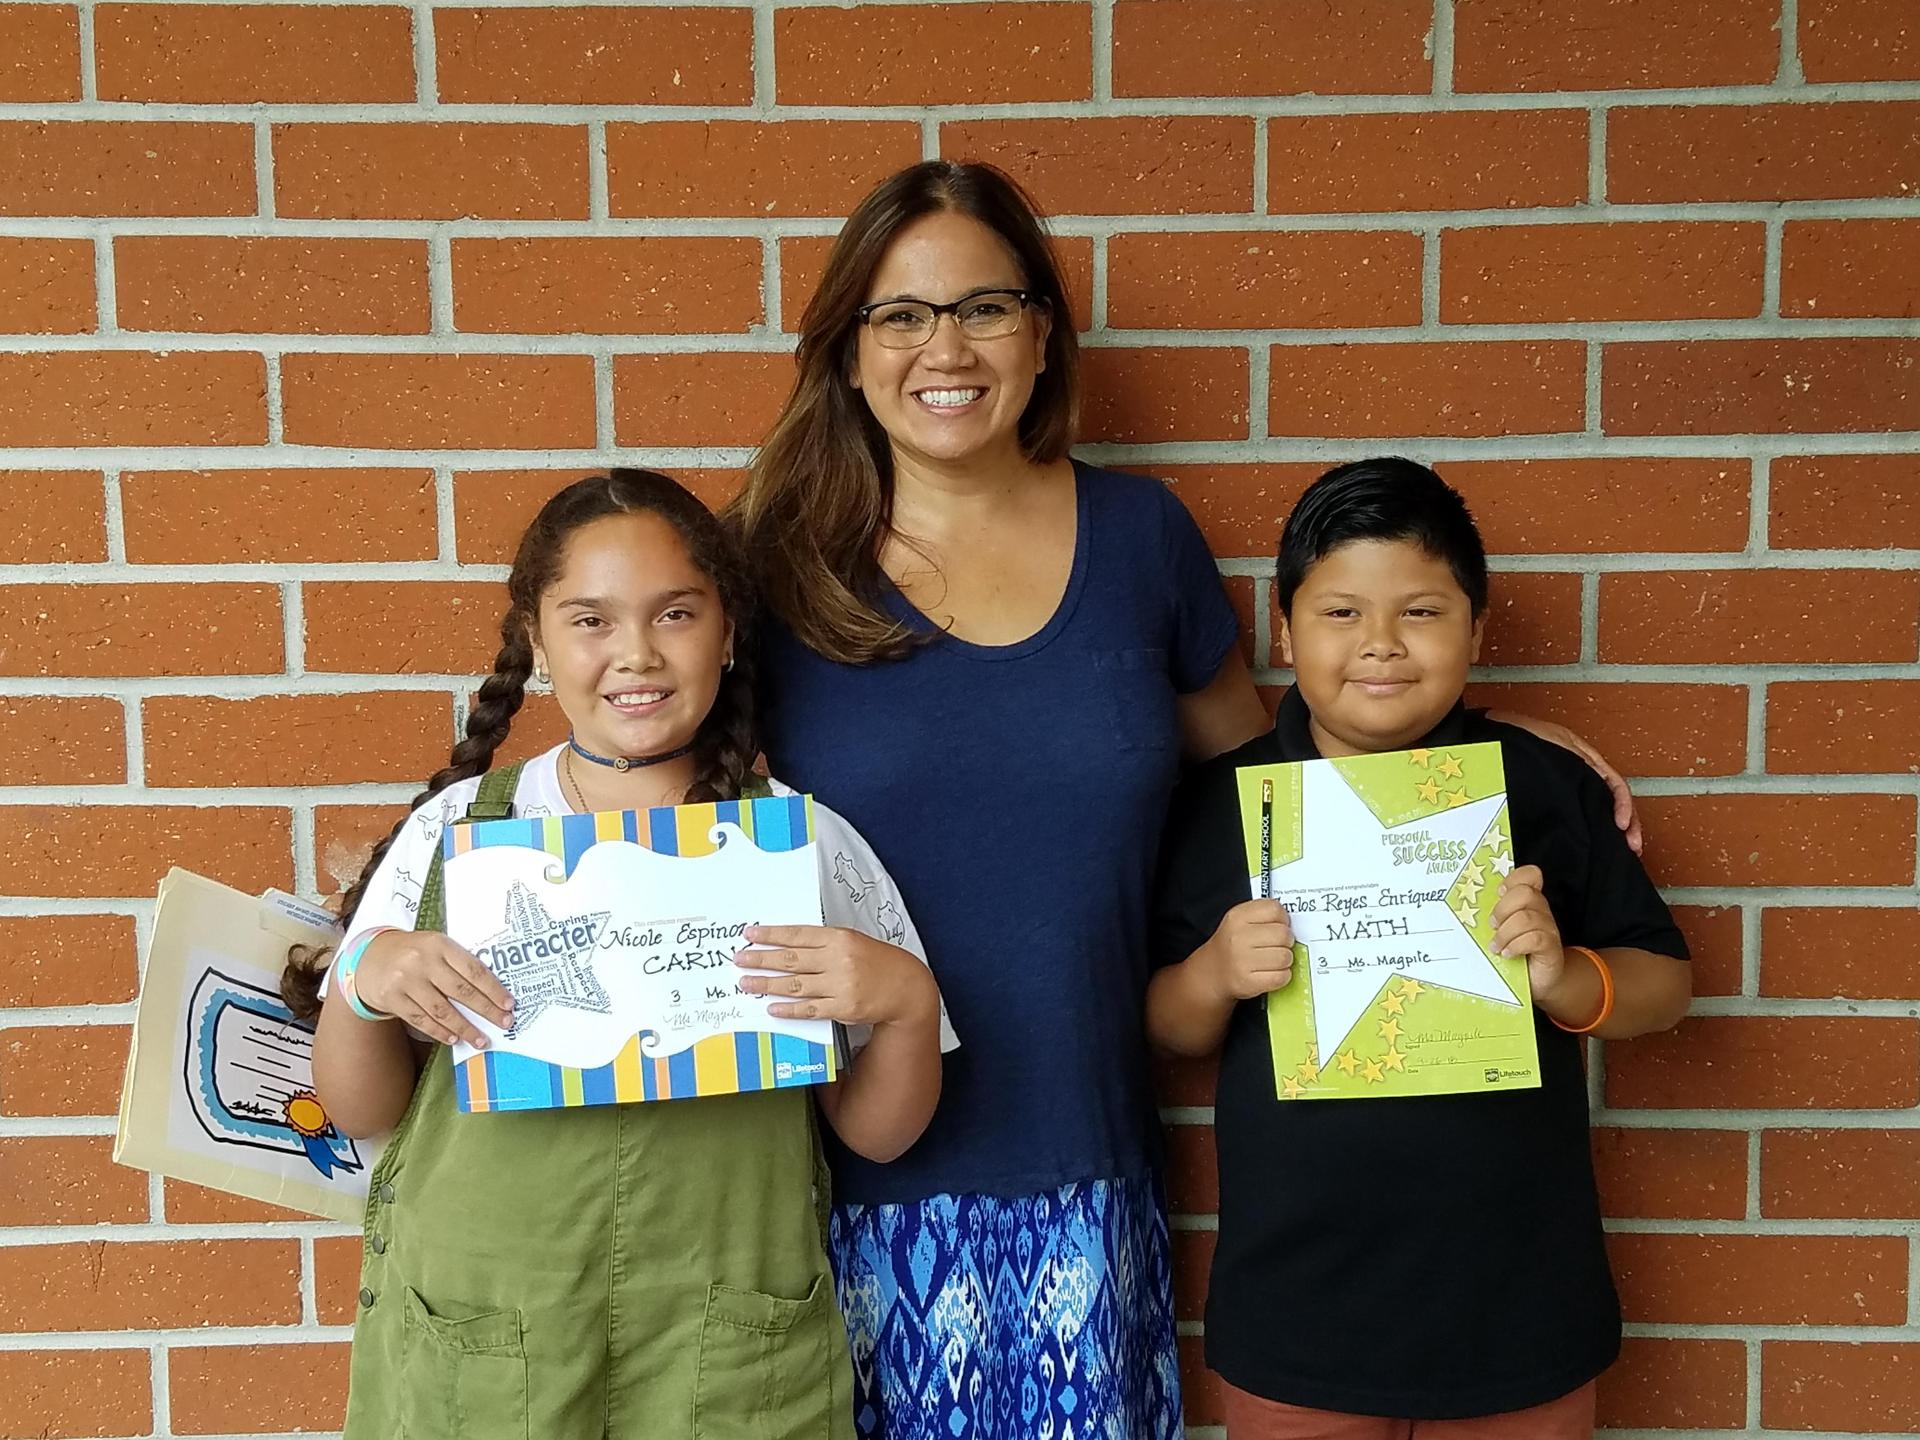 Ms. Magpile's Winners